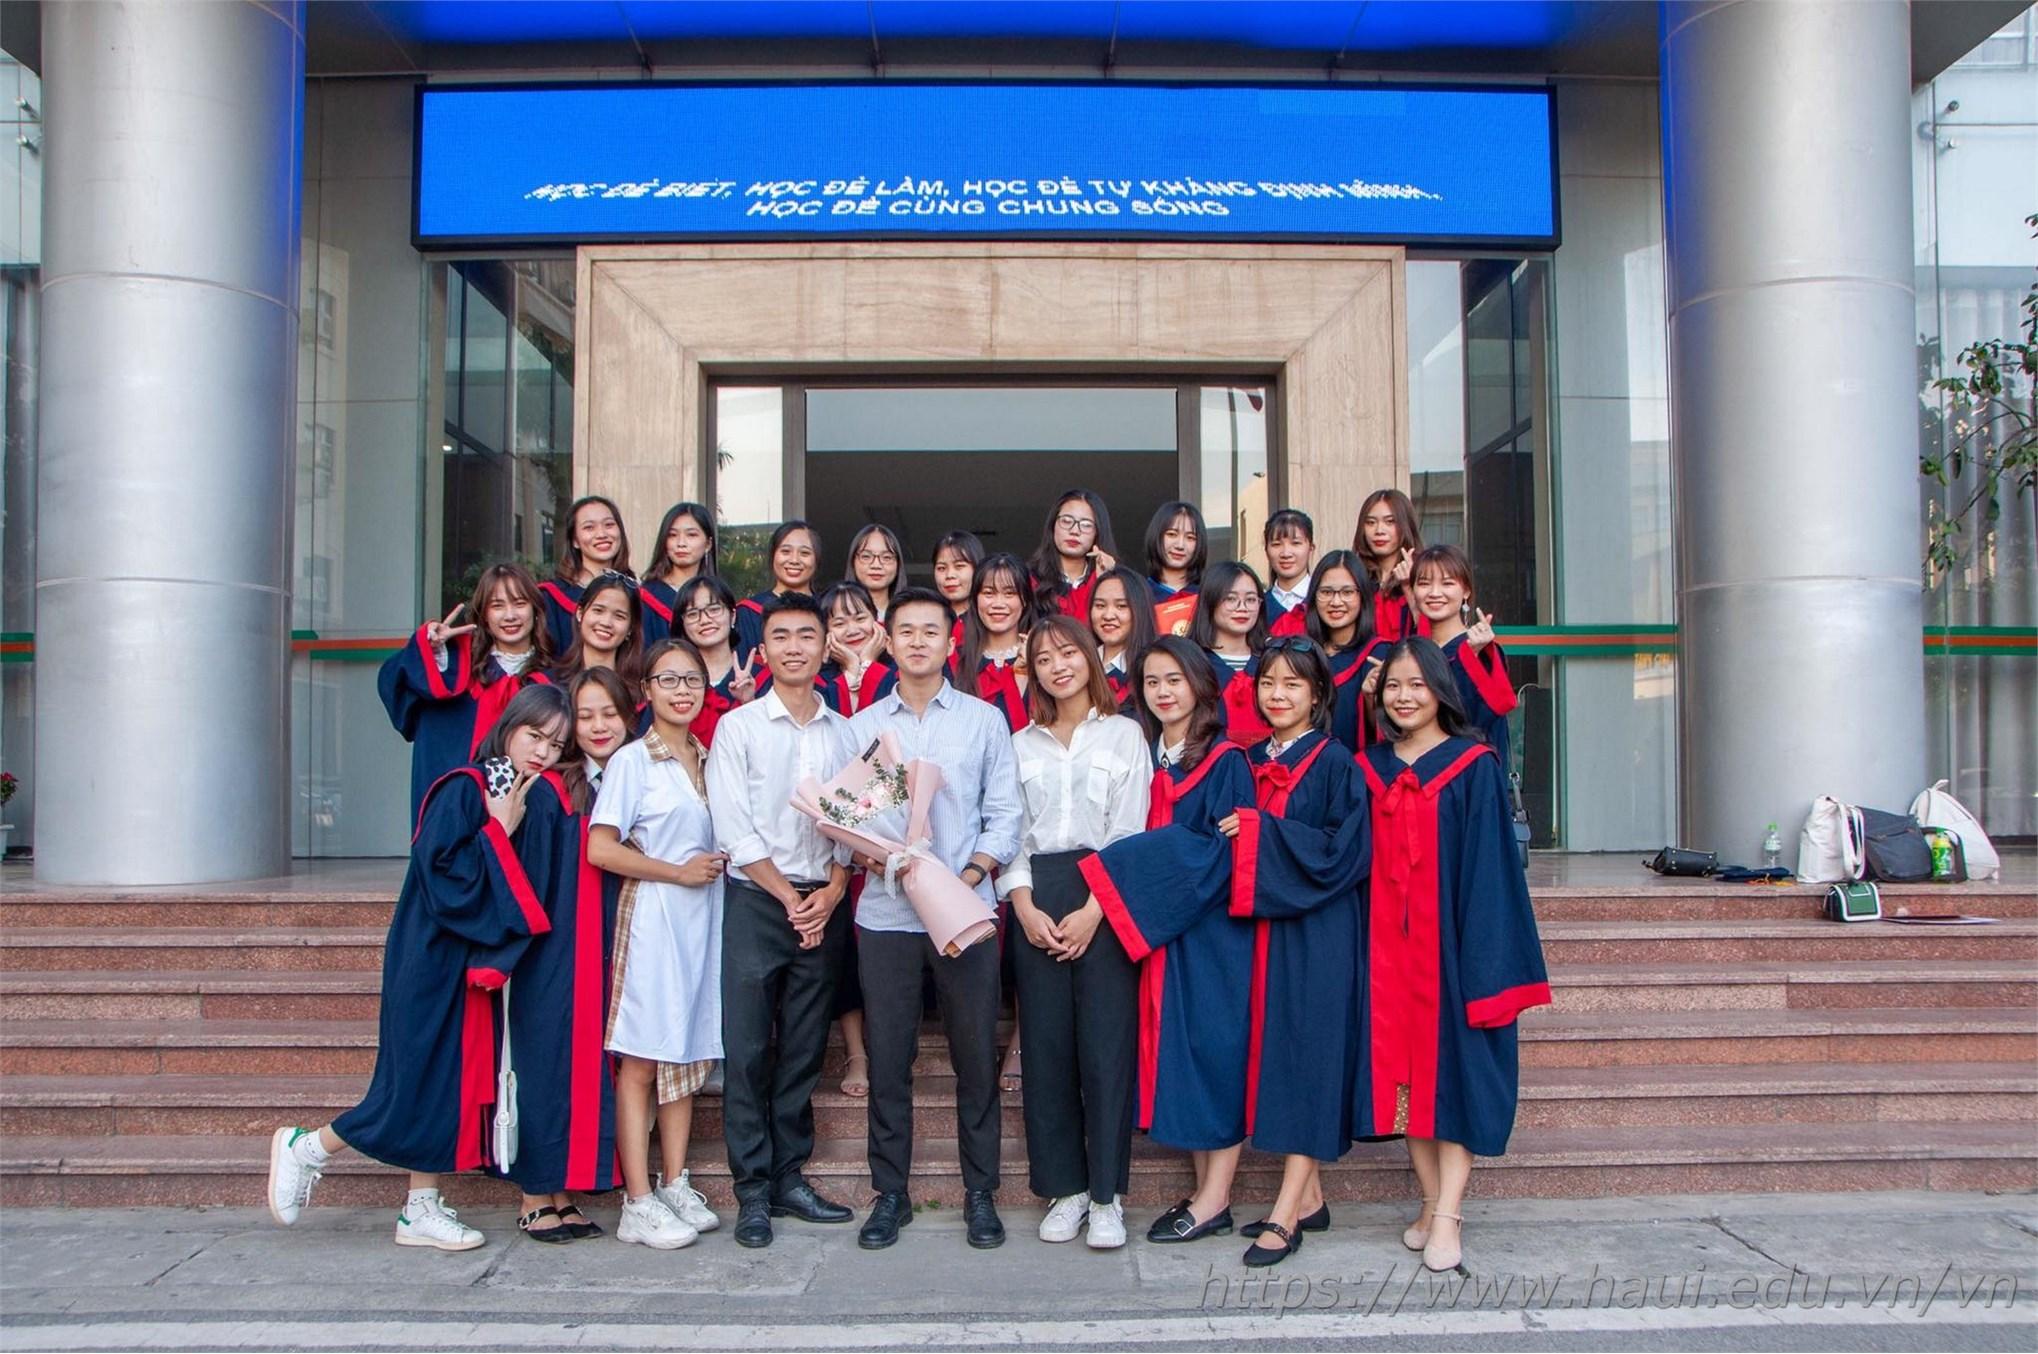 HaUI held the Graduation Ceremony & Degree Awarding Ceremony for 3455 Graduates of 2020